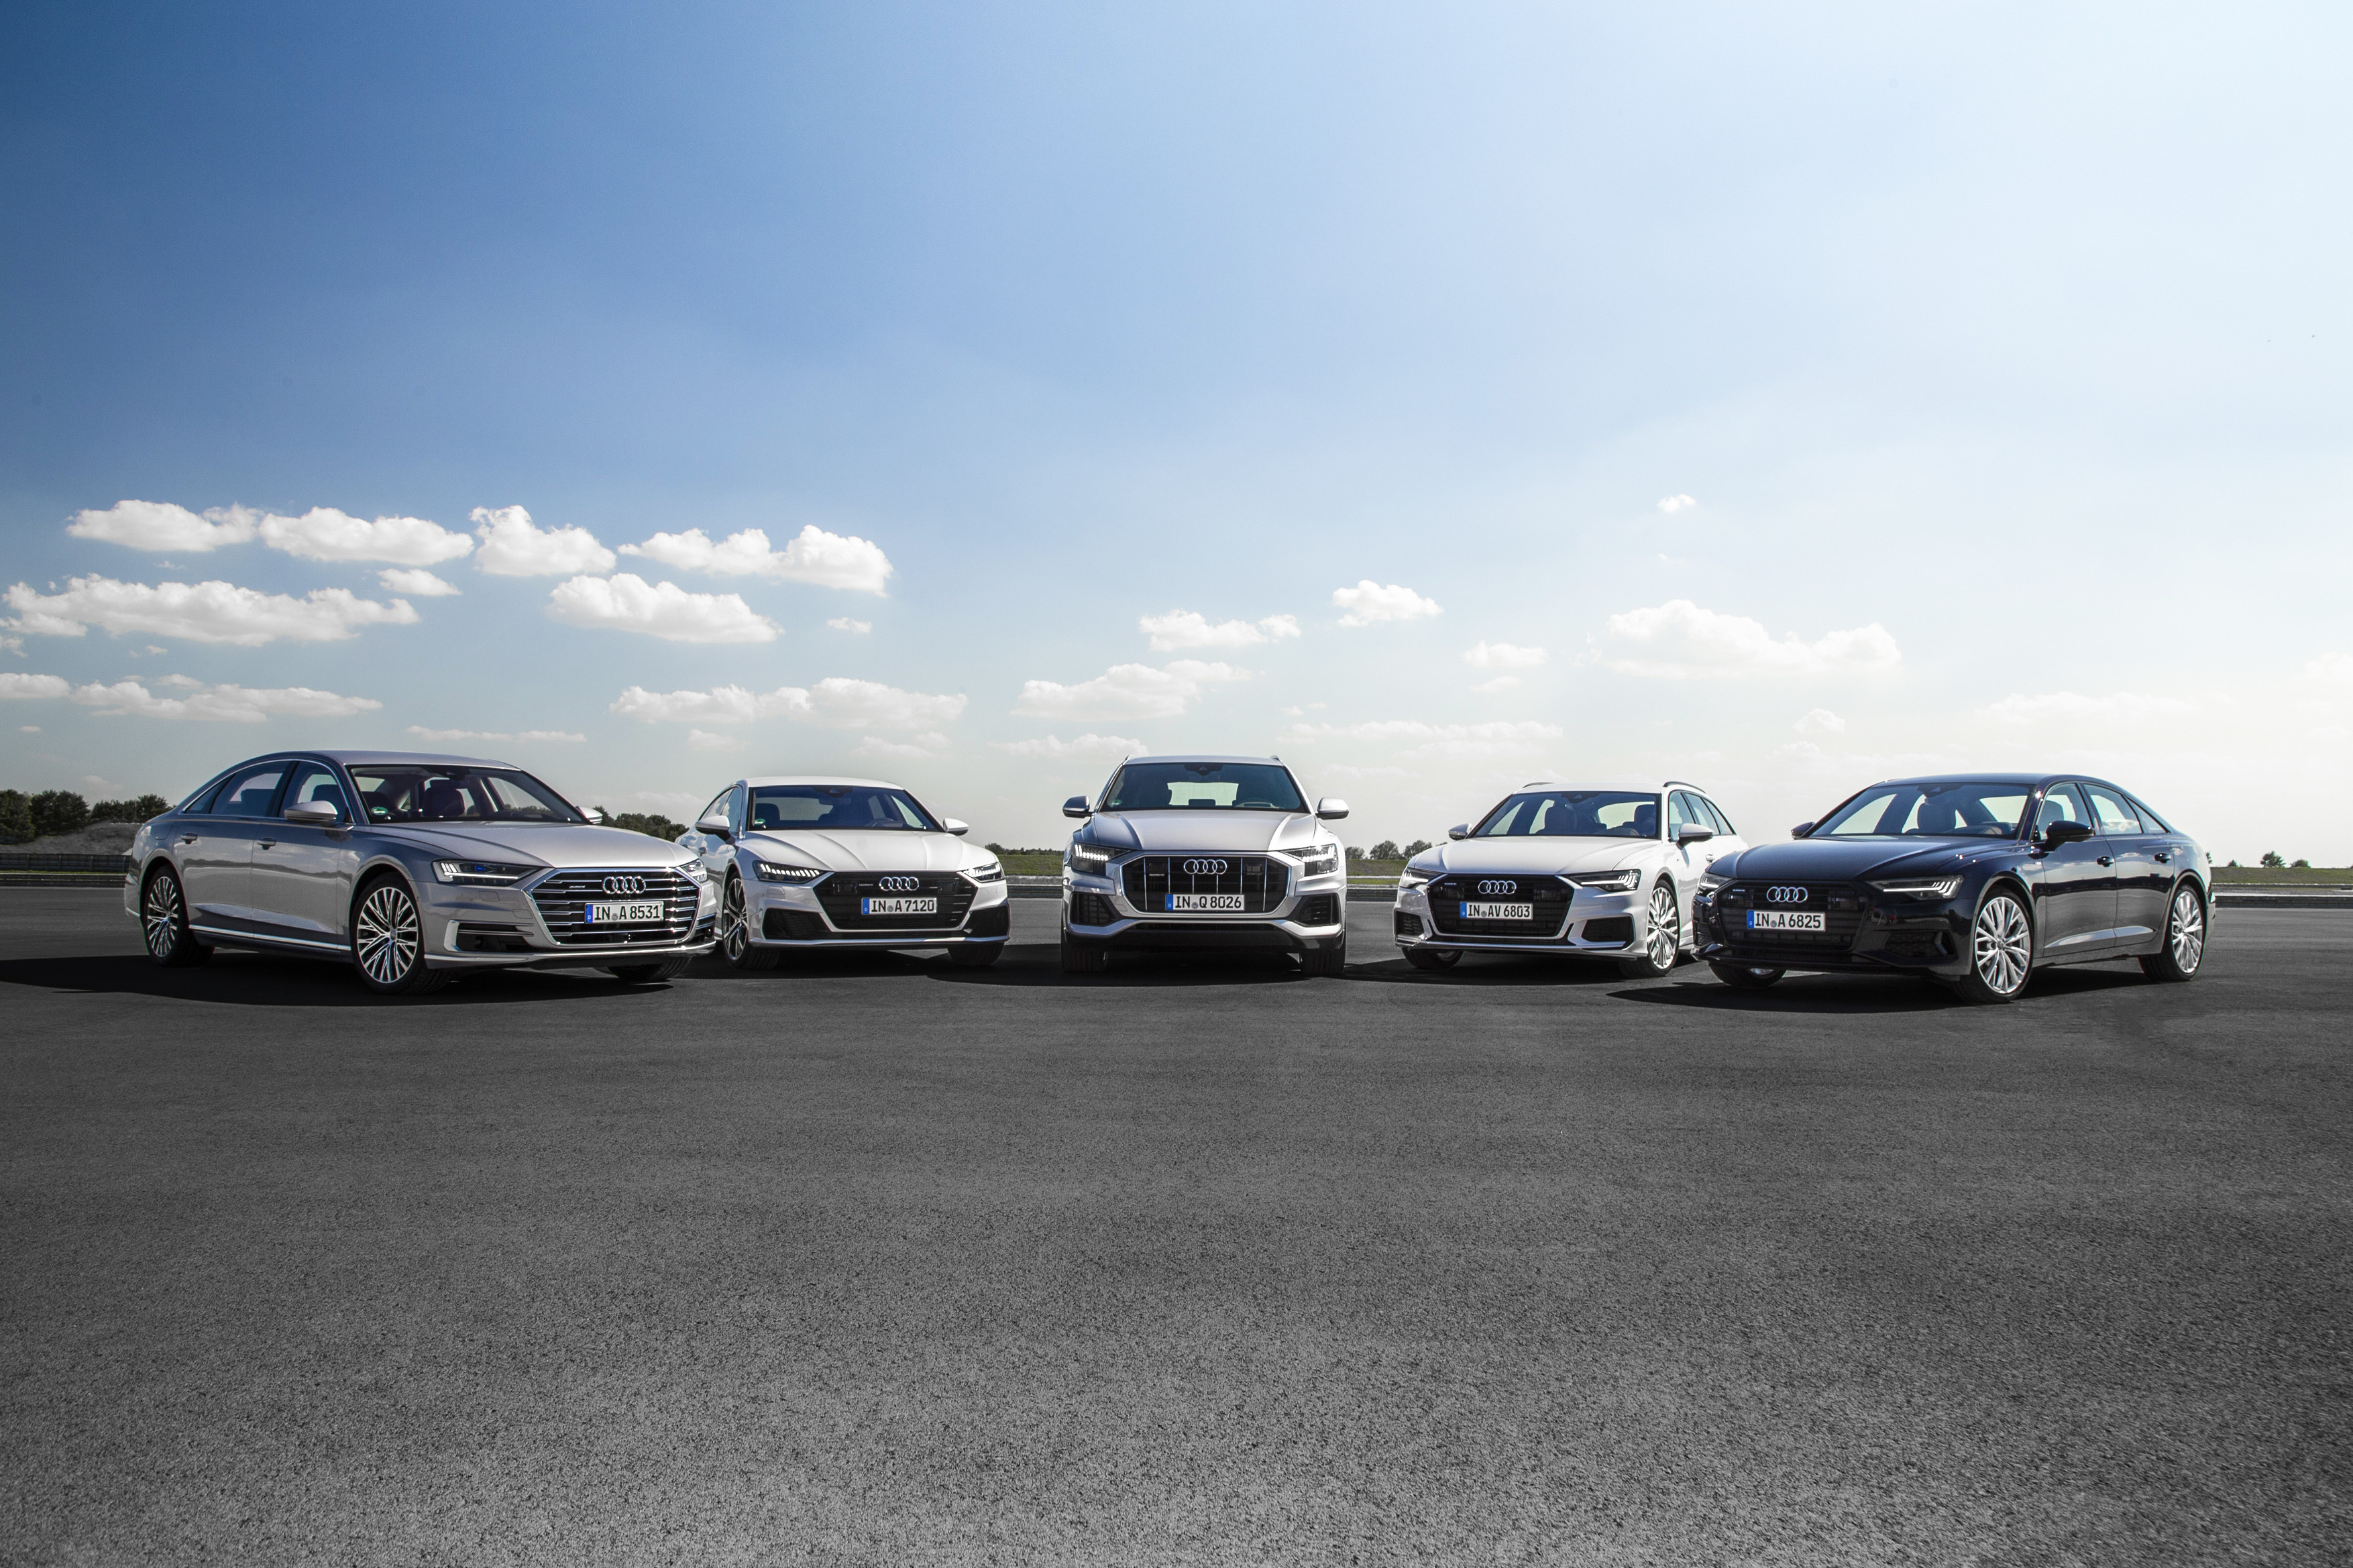 Audi's massive model onslaught